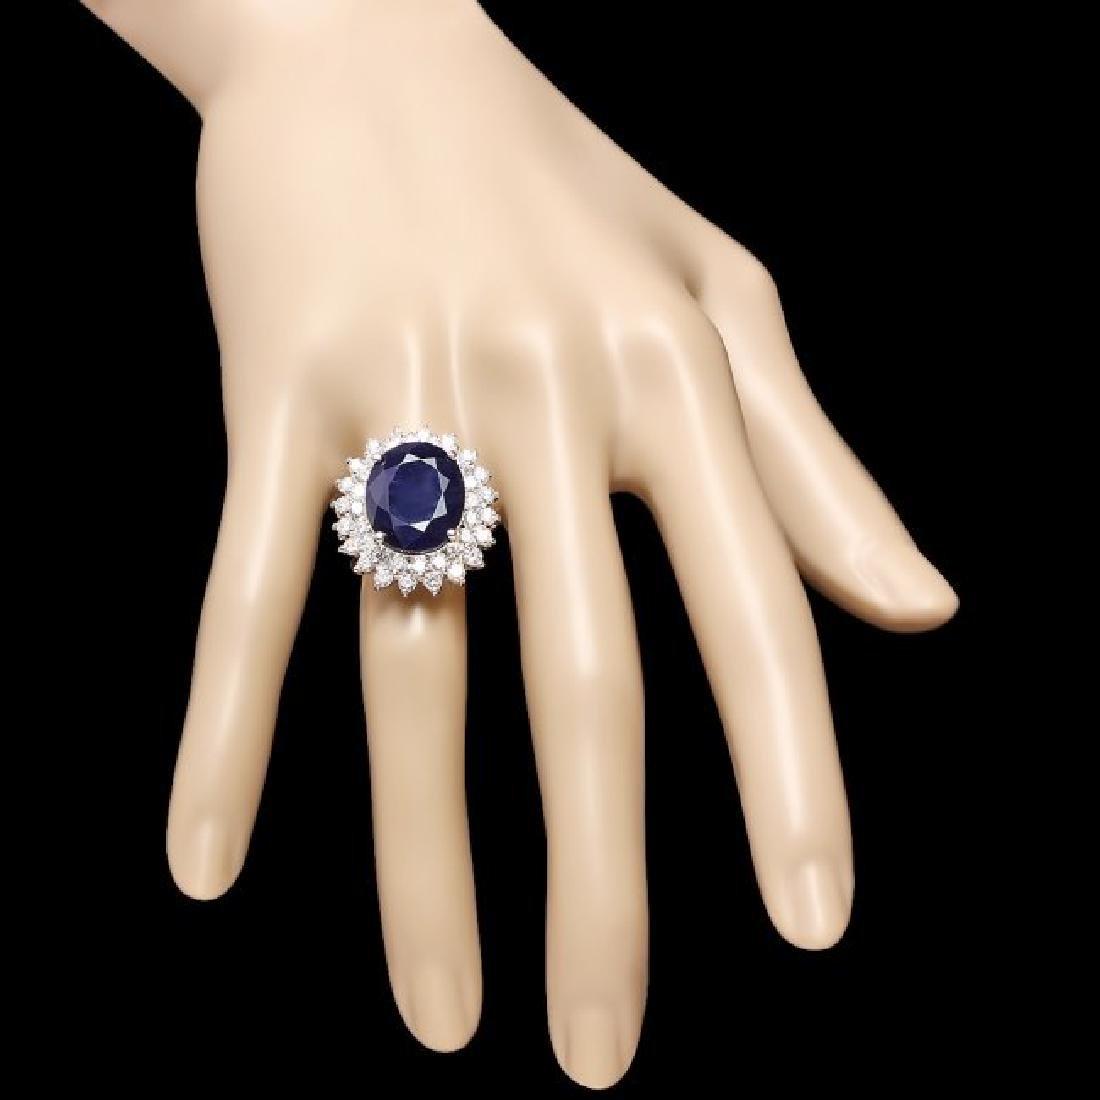 14k Gold 11.50ct Sapphire 2.50ct Diamond Ring - 4